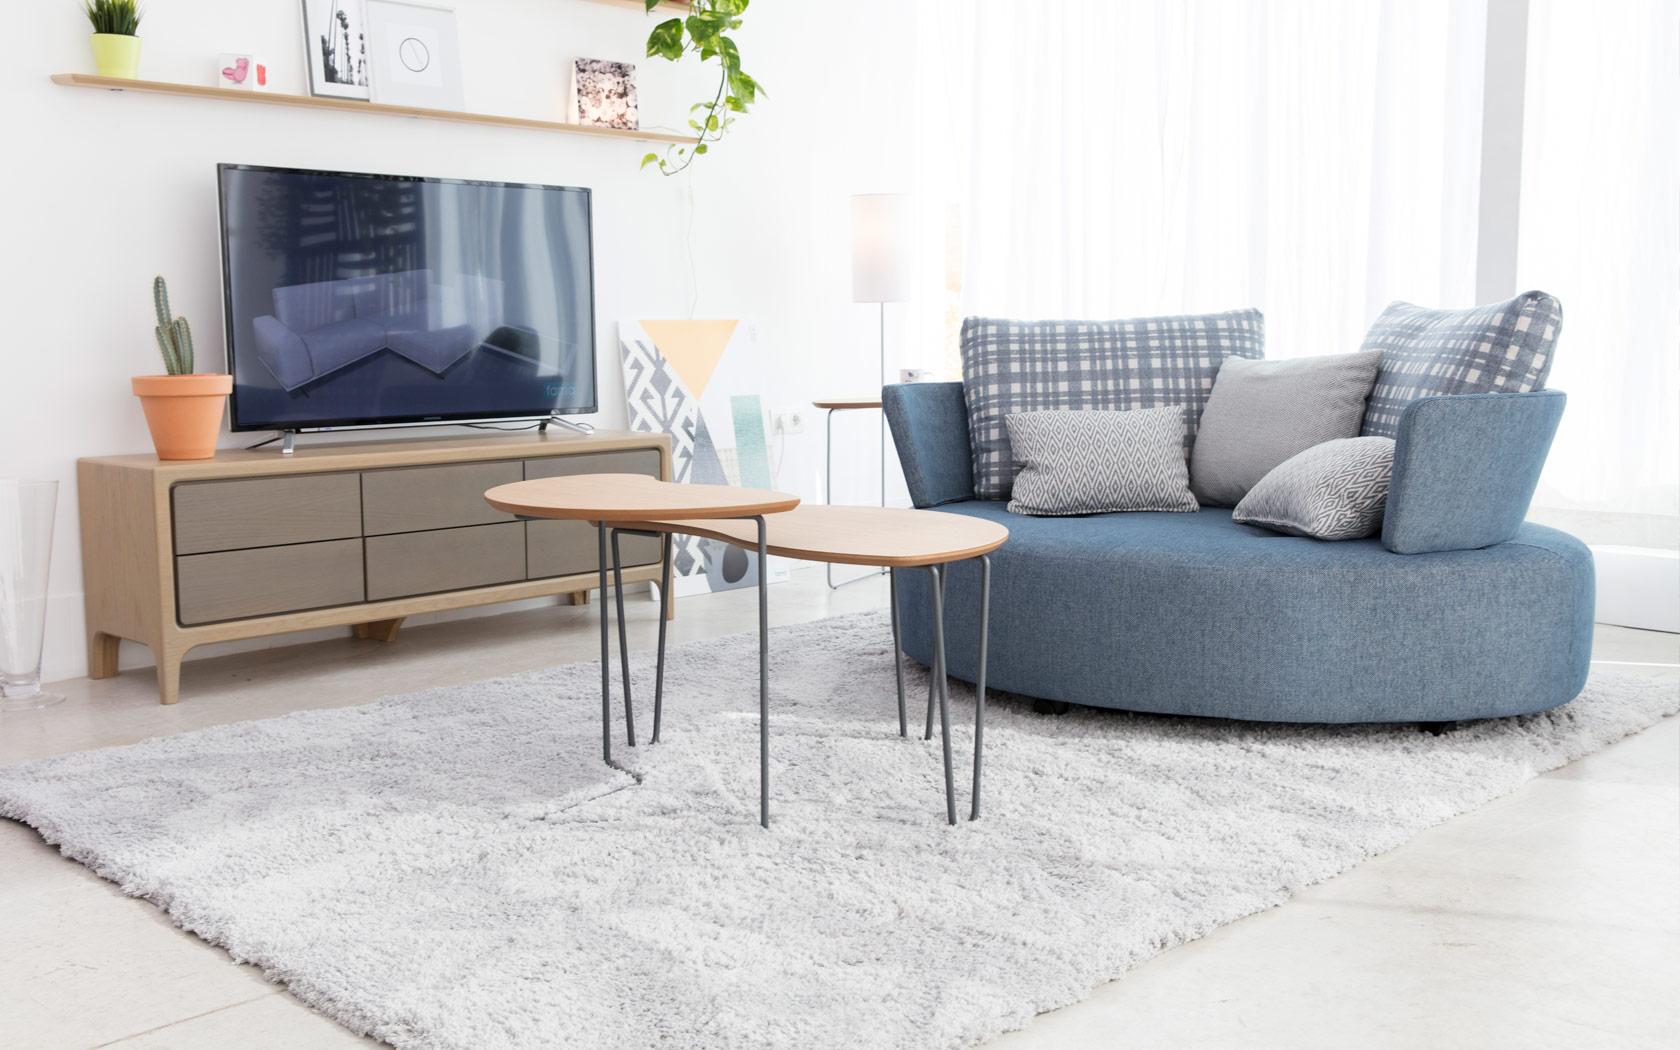 Mycuore sofa Fama 2020 03